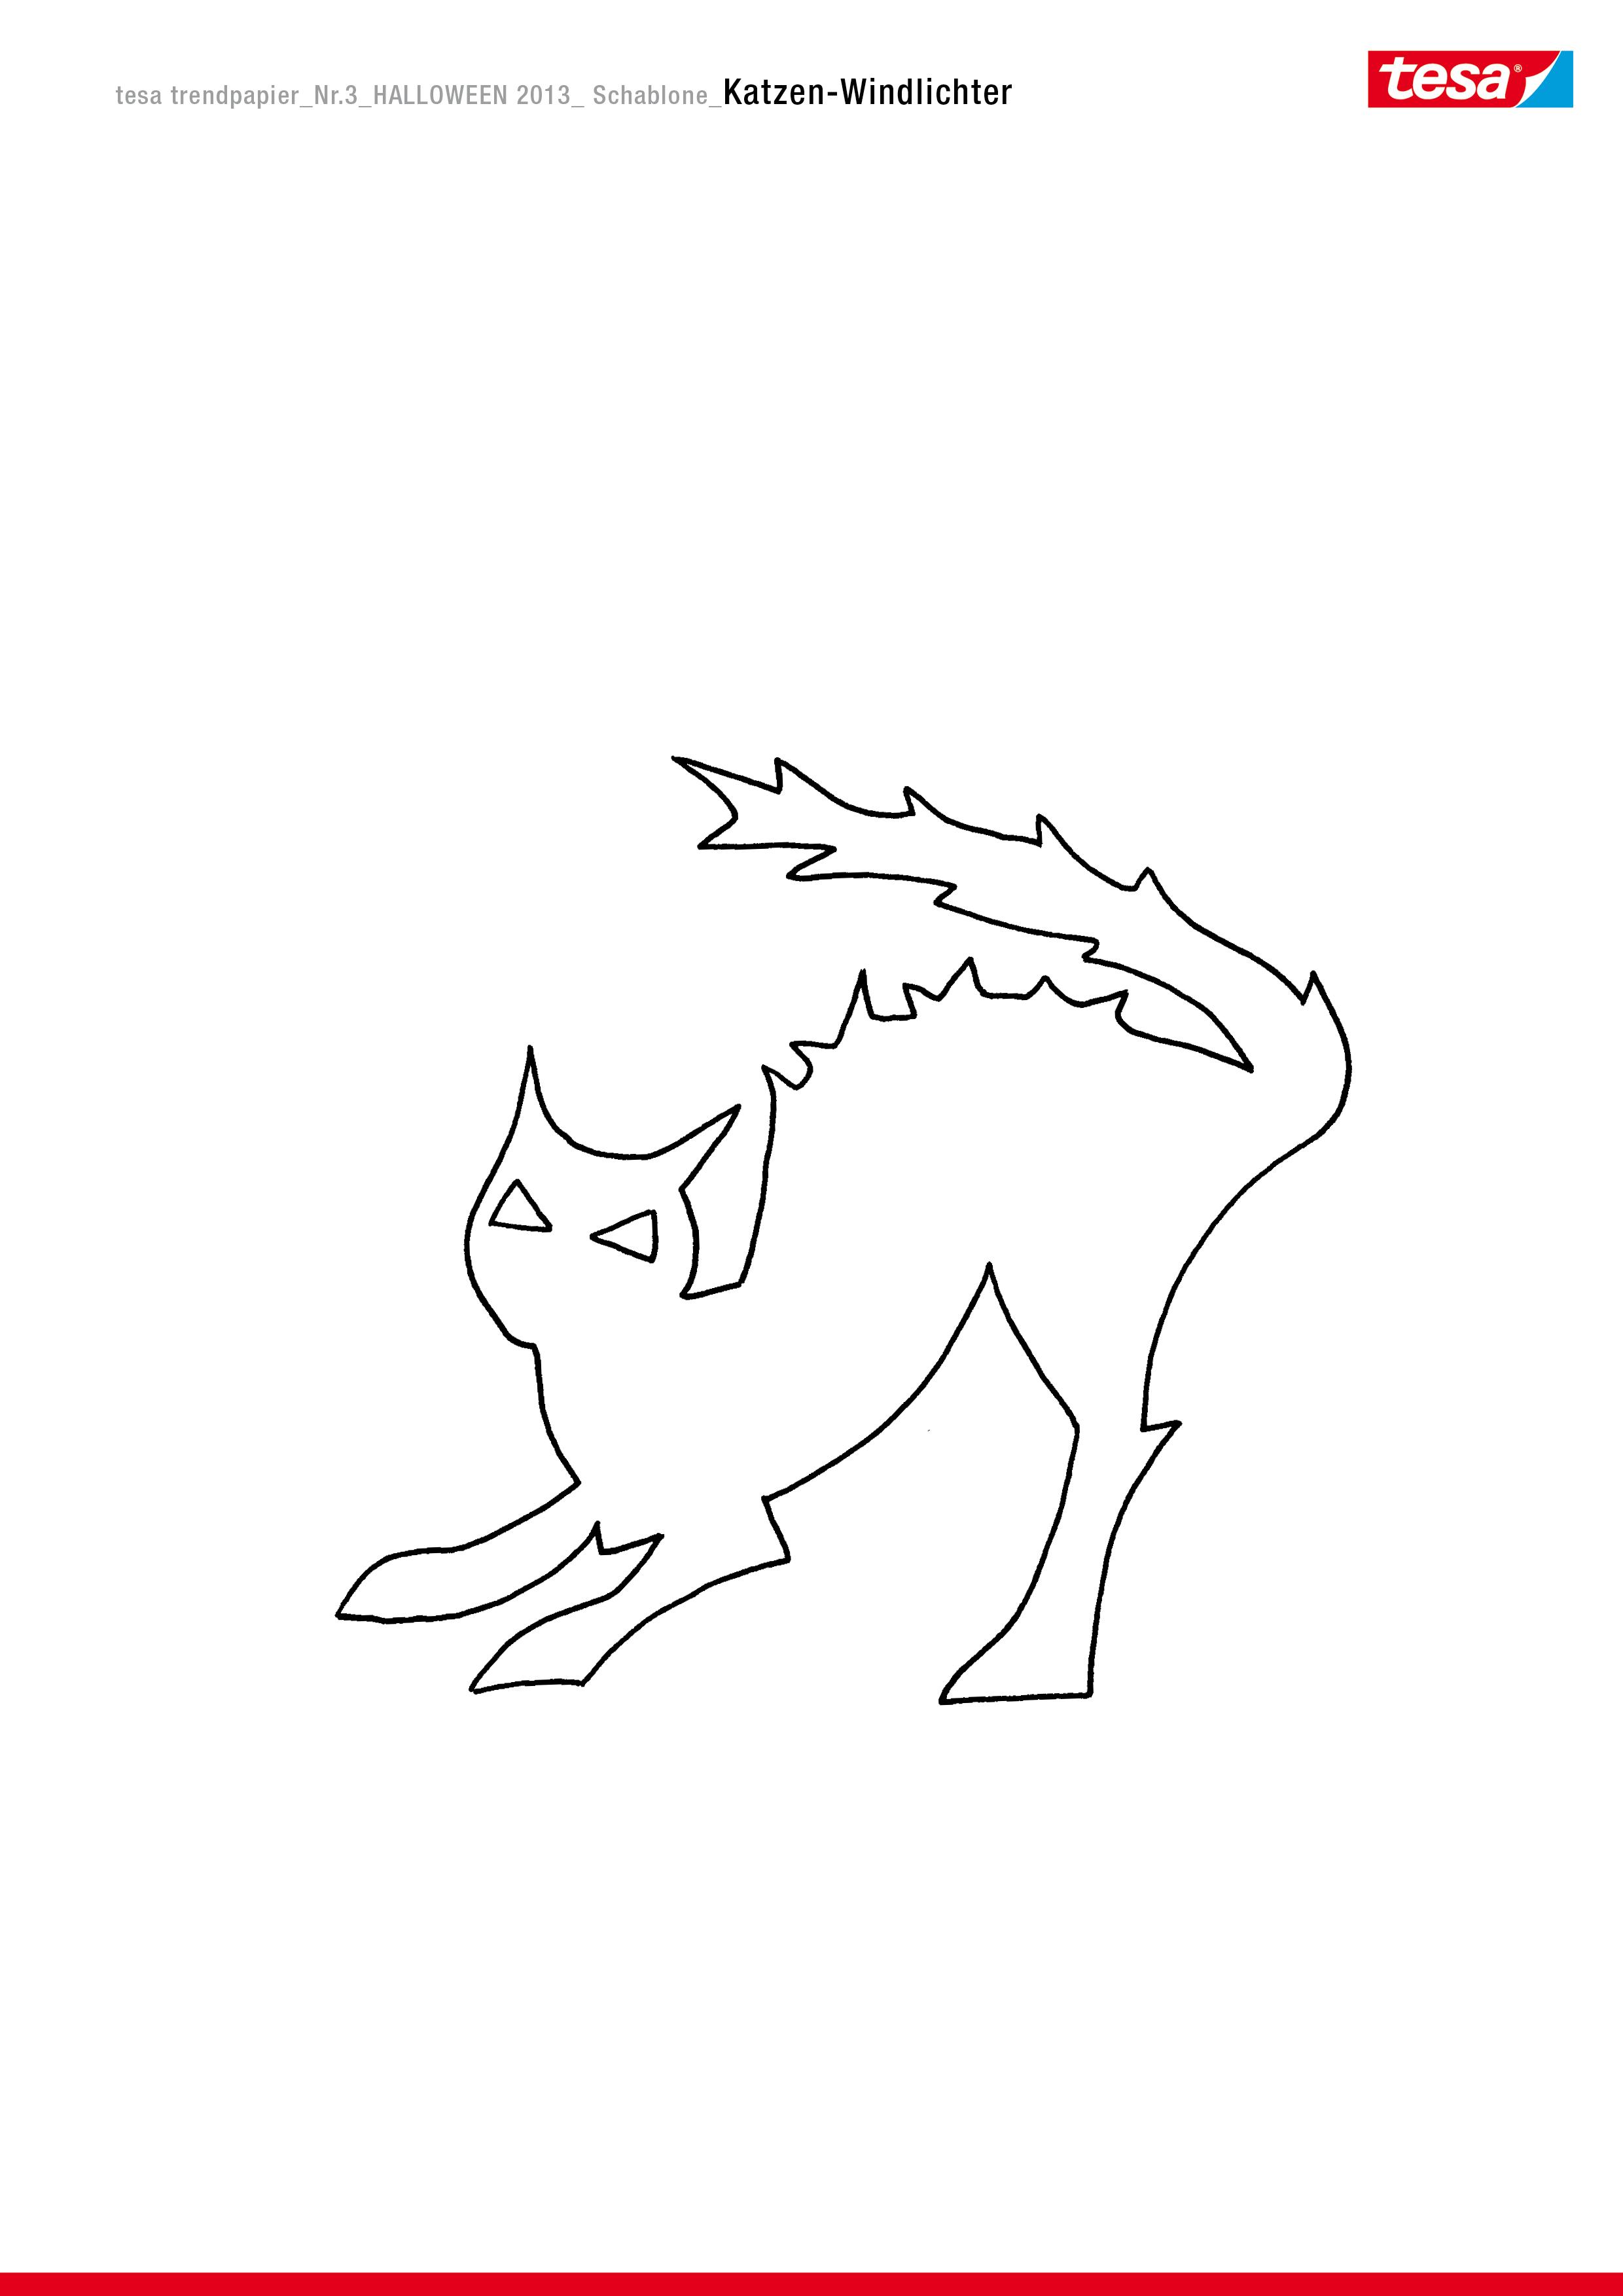 windlichter: katzen-kerzenschein - tesa